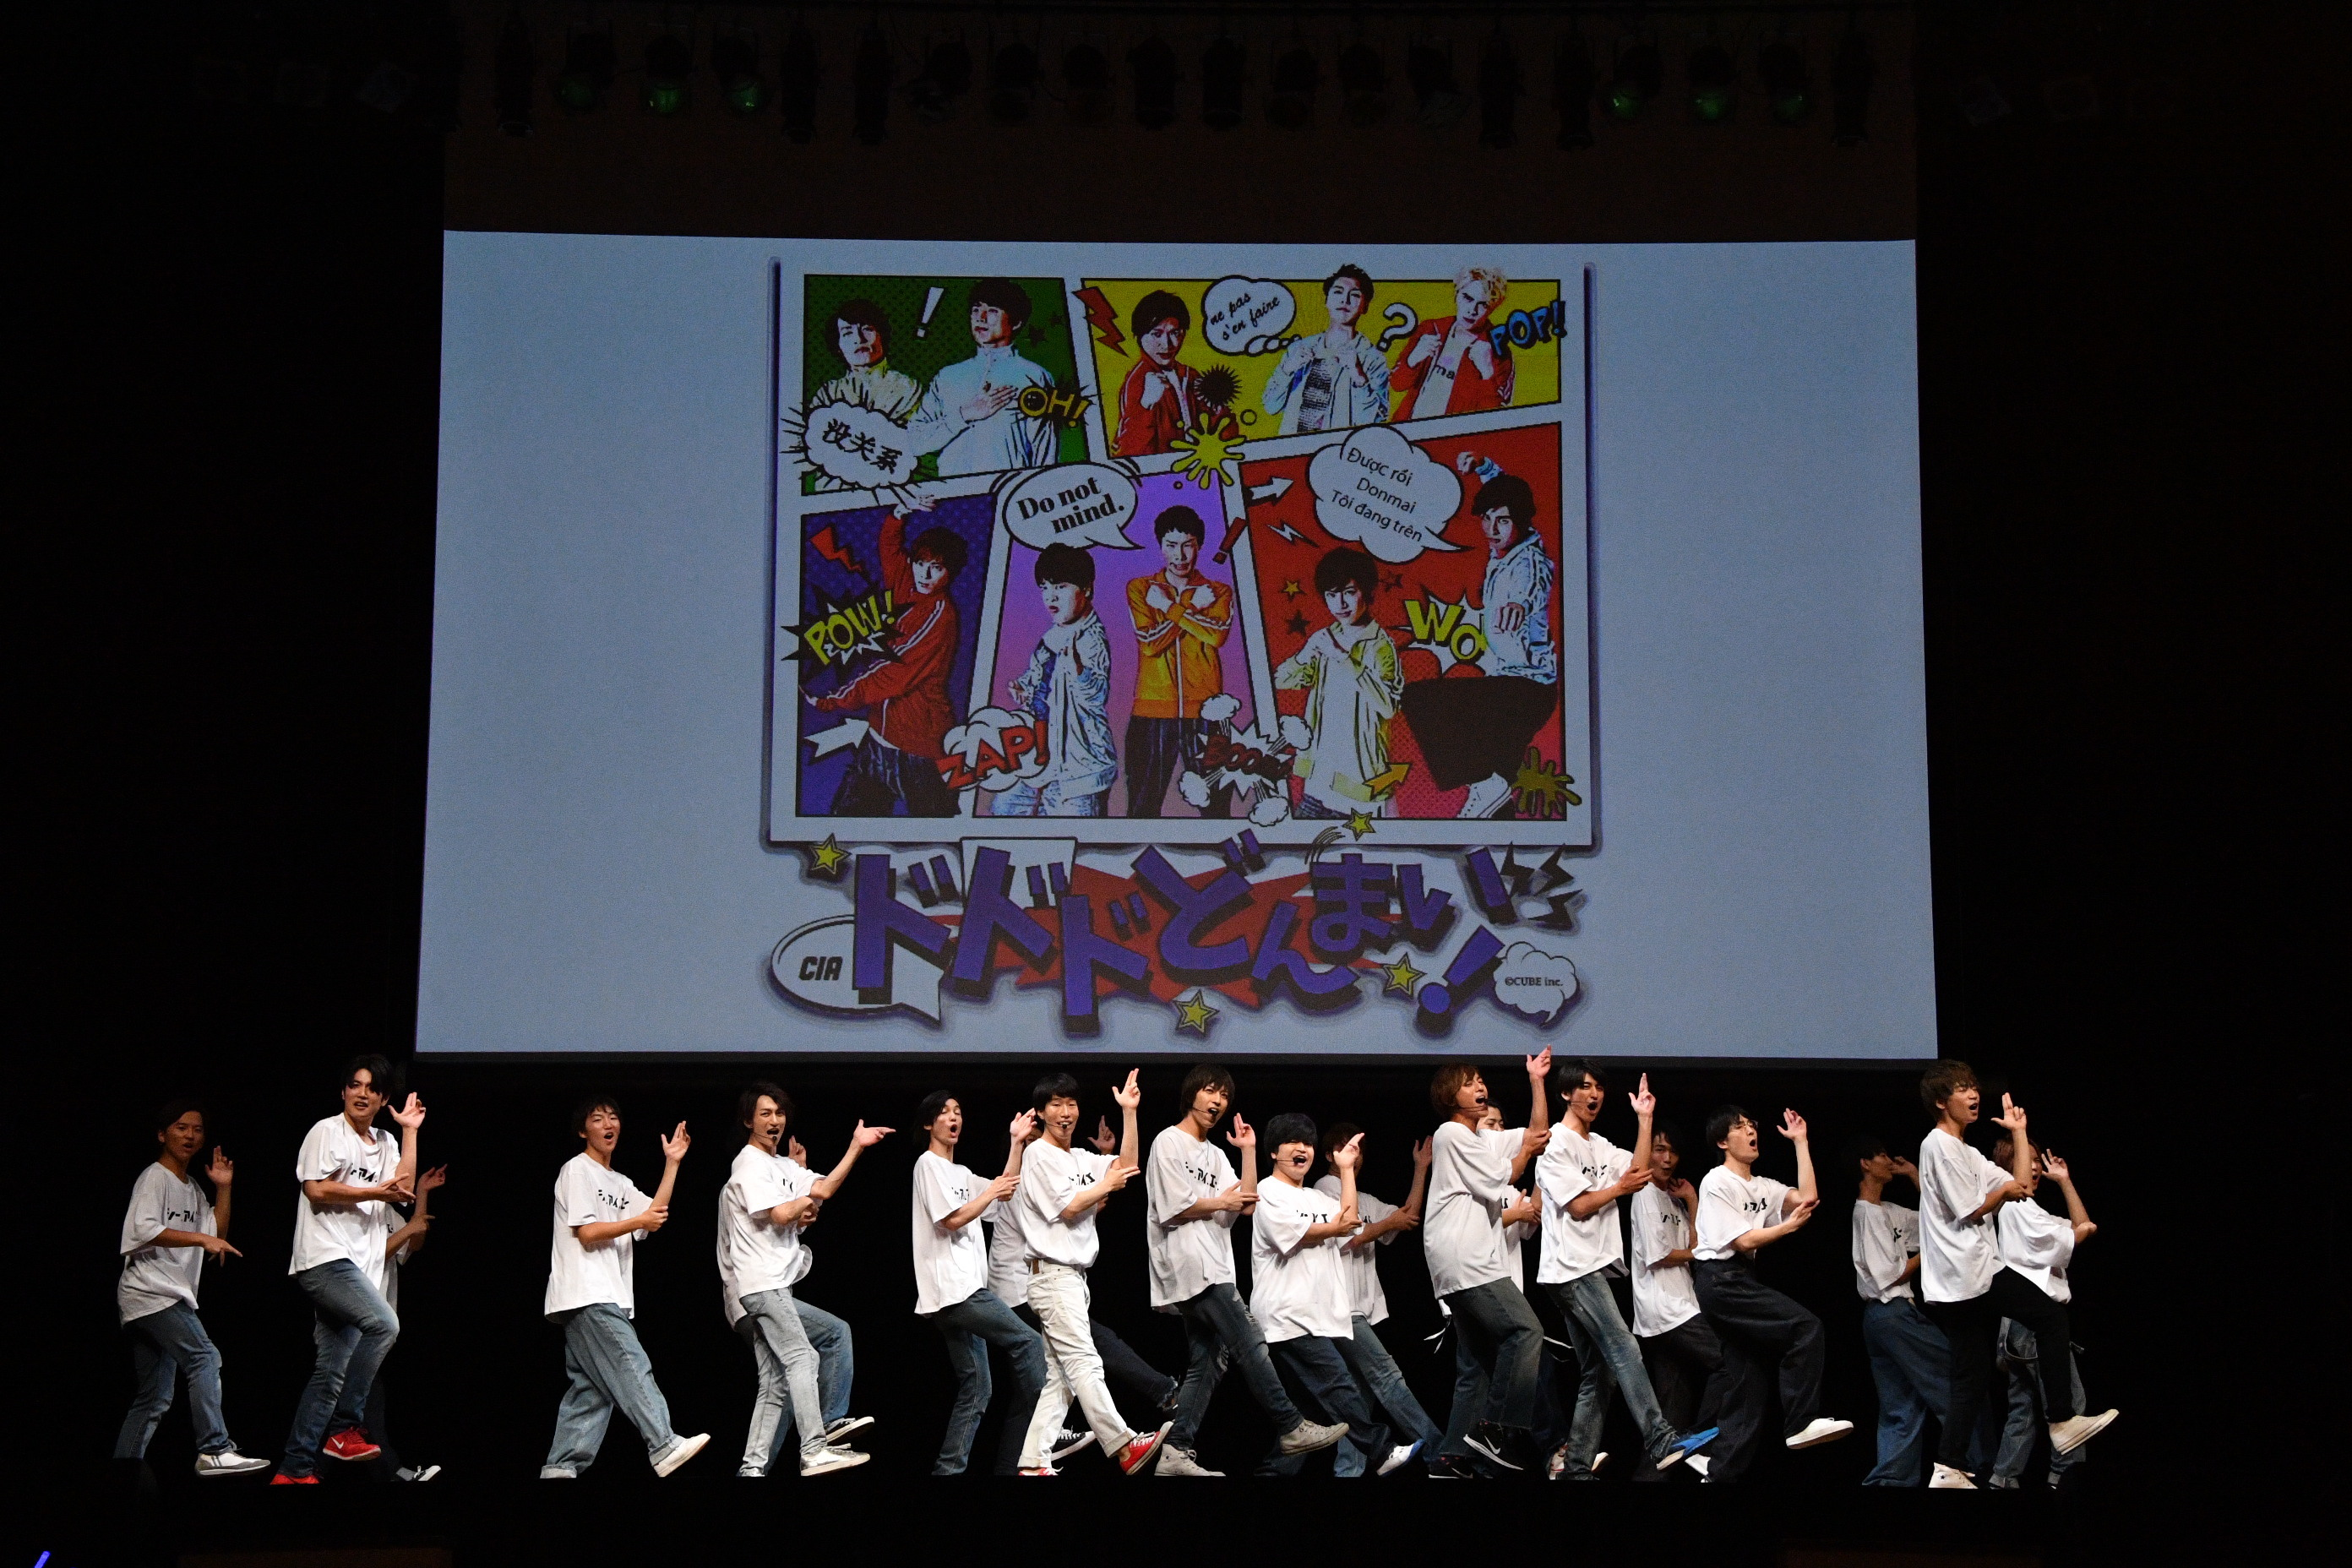 『MISSION IN SUMMER 2019 〜令和もよろしく C.I.A. 的?夏の運動会〜』の模様 撮影:桜井隆幸